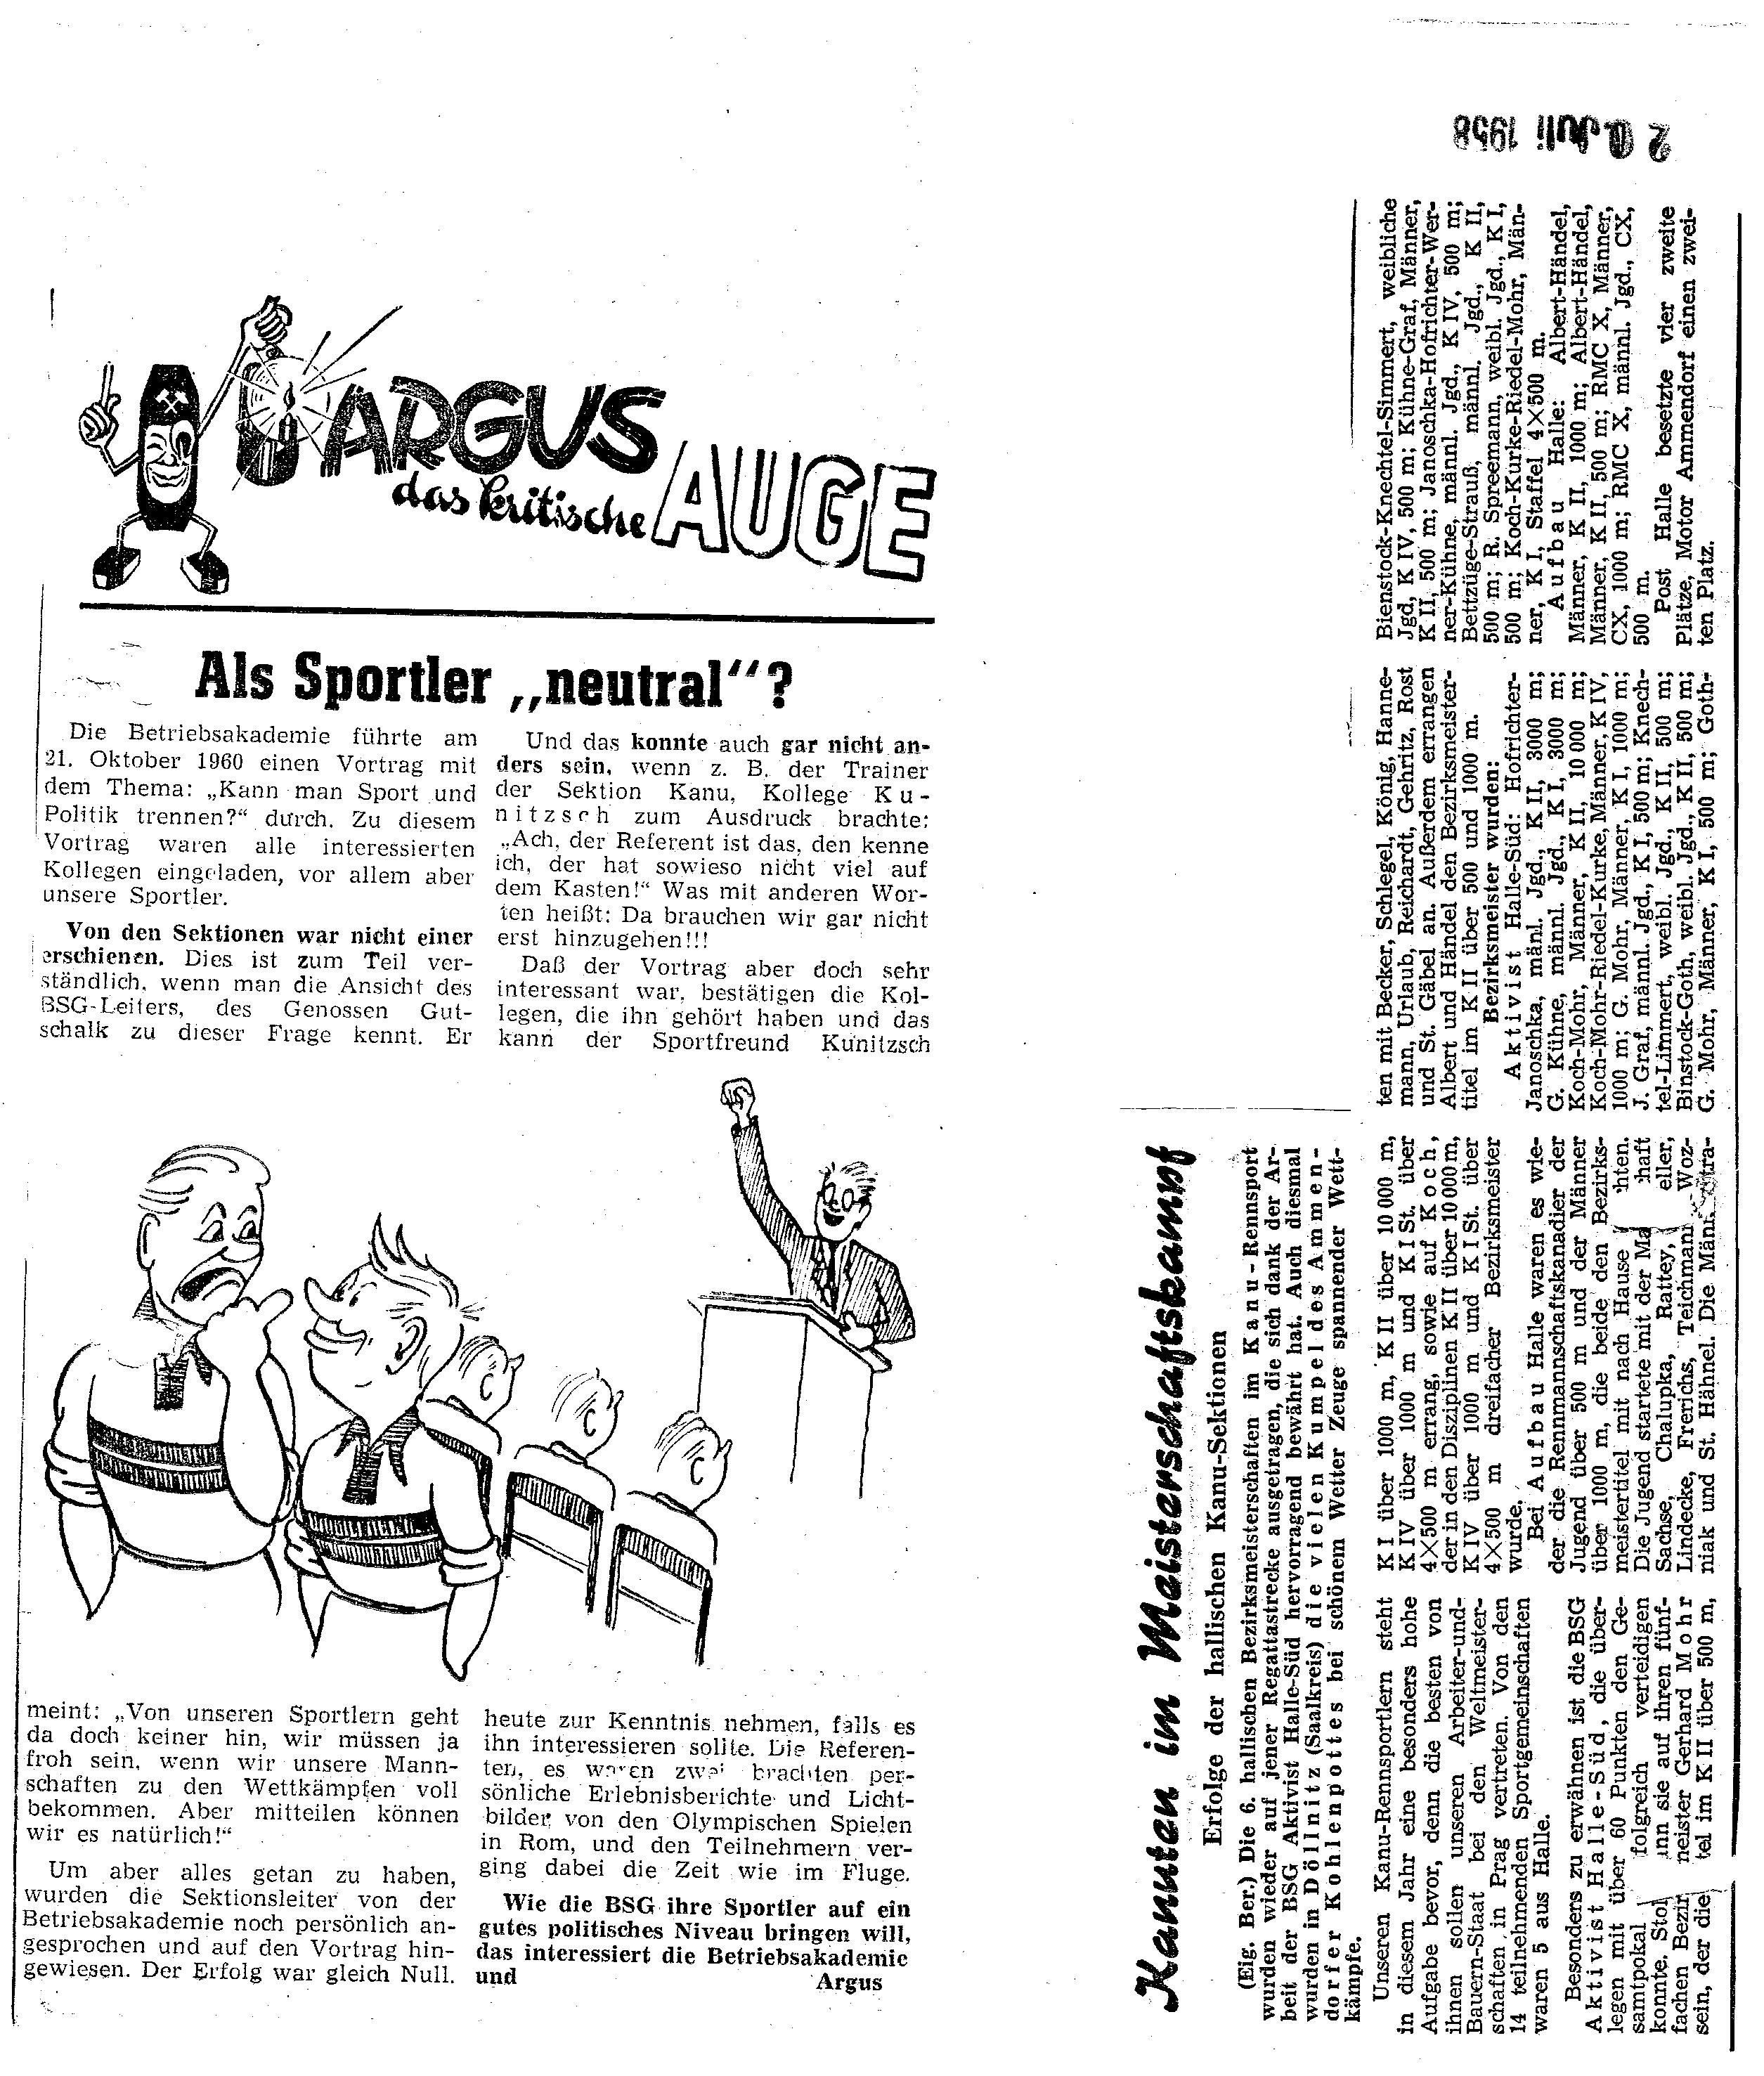 1958-07-20 als Sportler neutral, Kanuten im Meisterschaftskampf